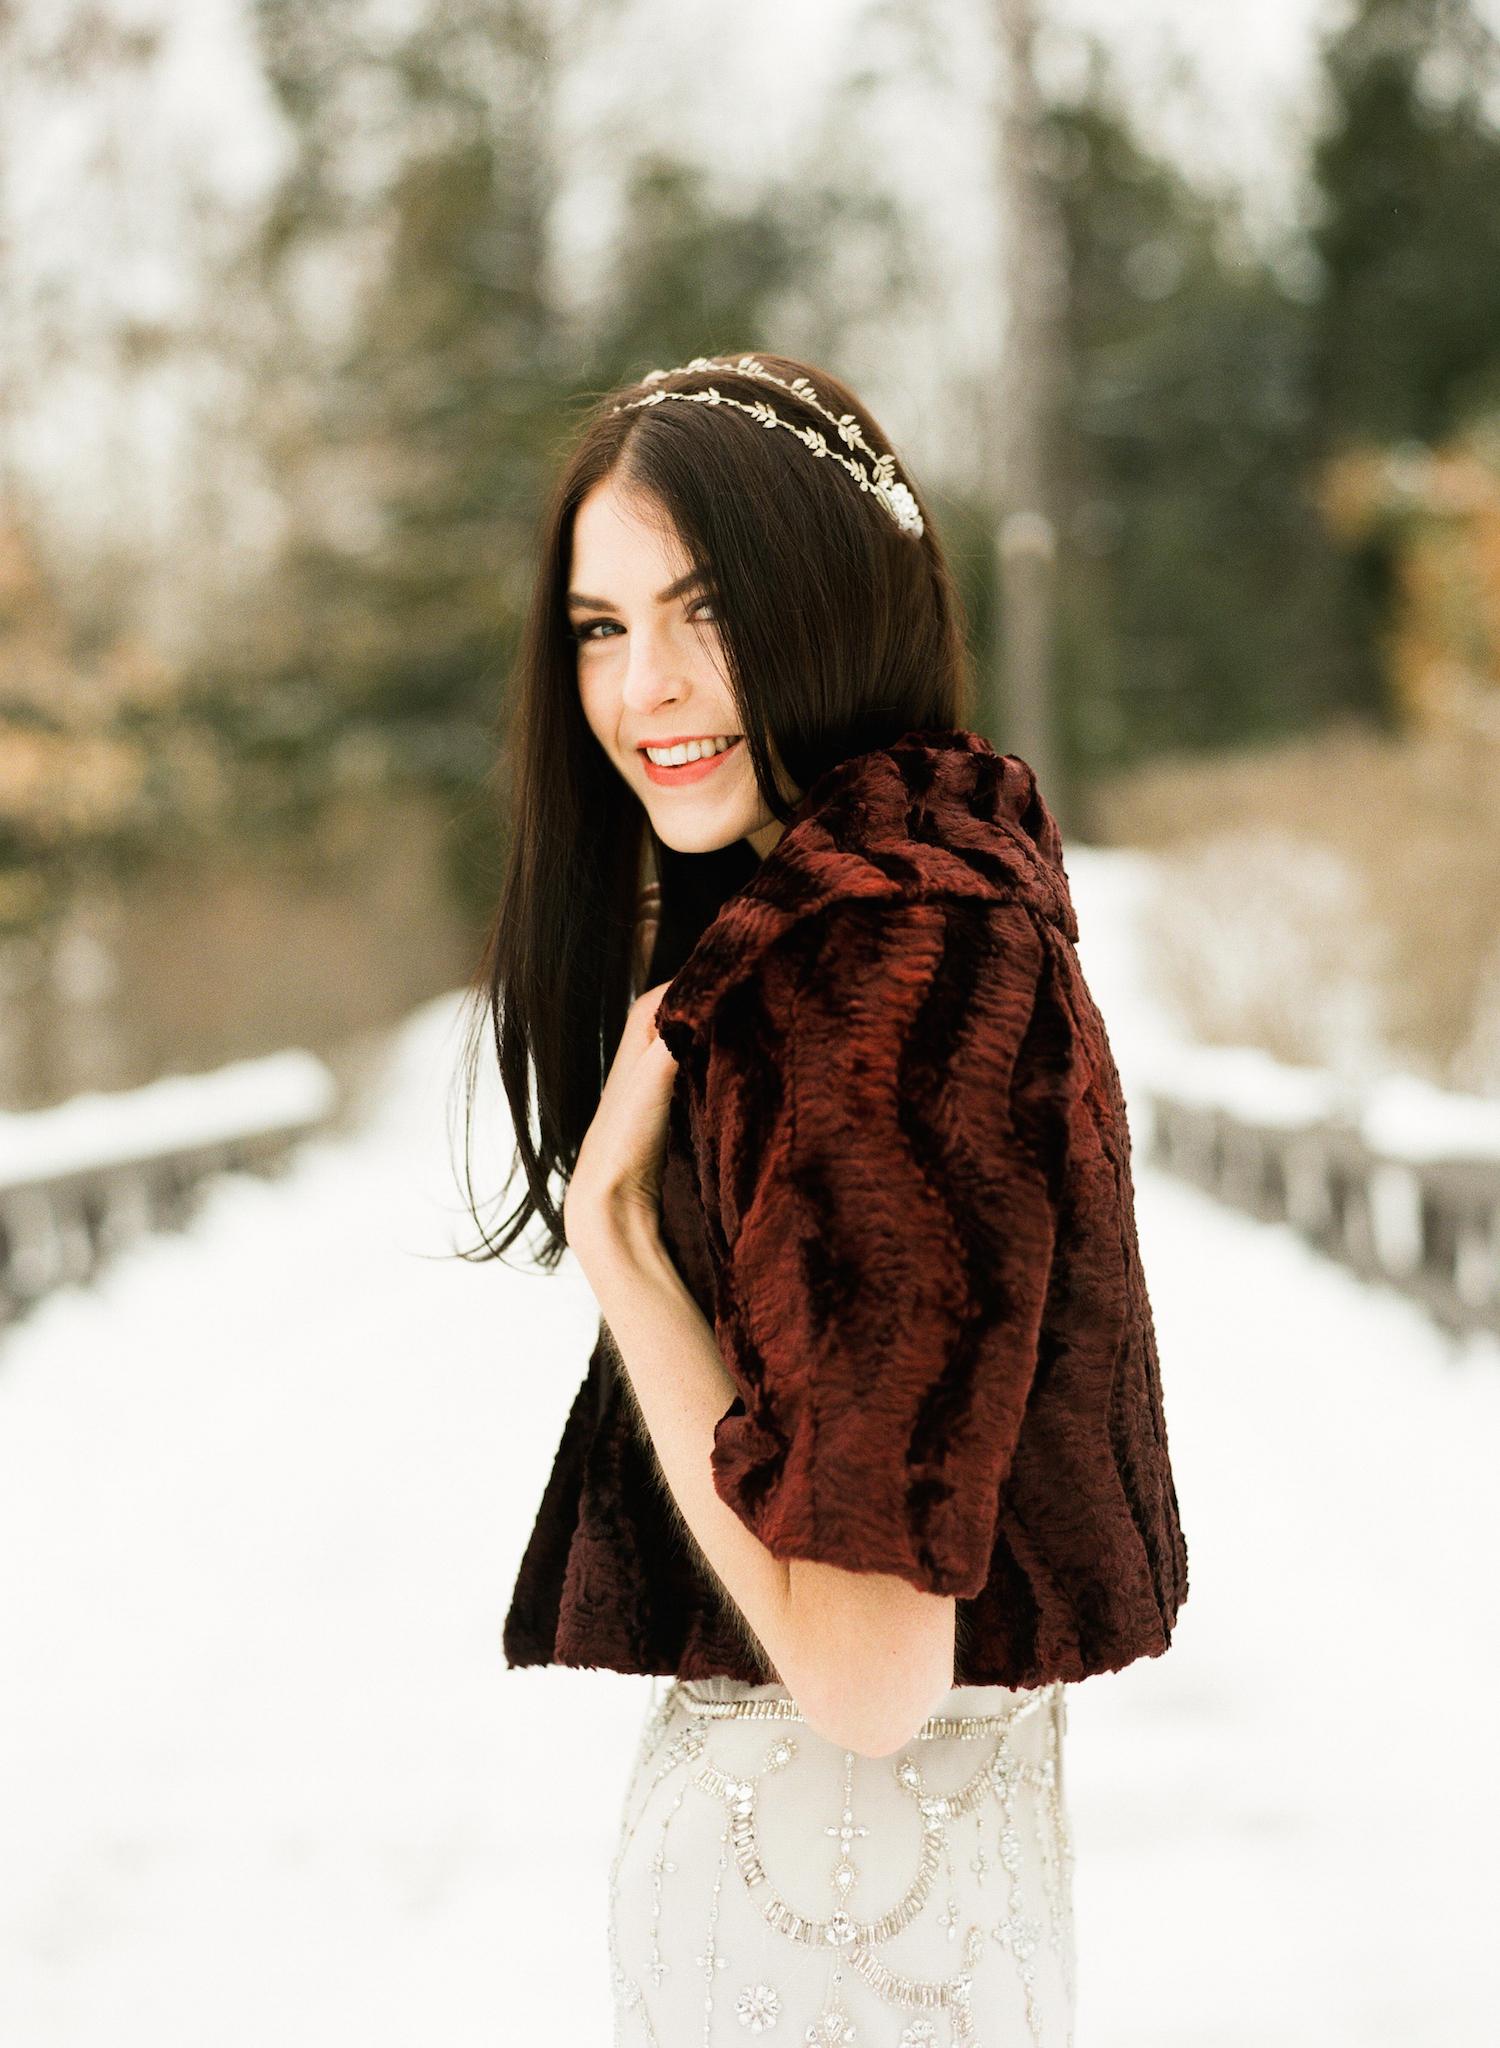 Winter Editorial-JennyPackham-LindsayMaddenPhotography-14 copy.jpg